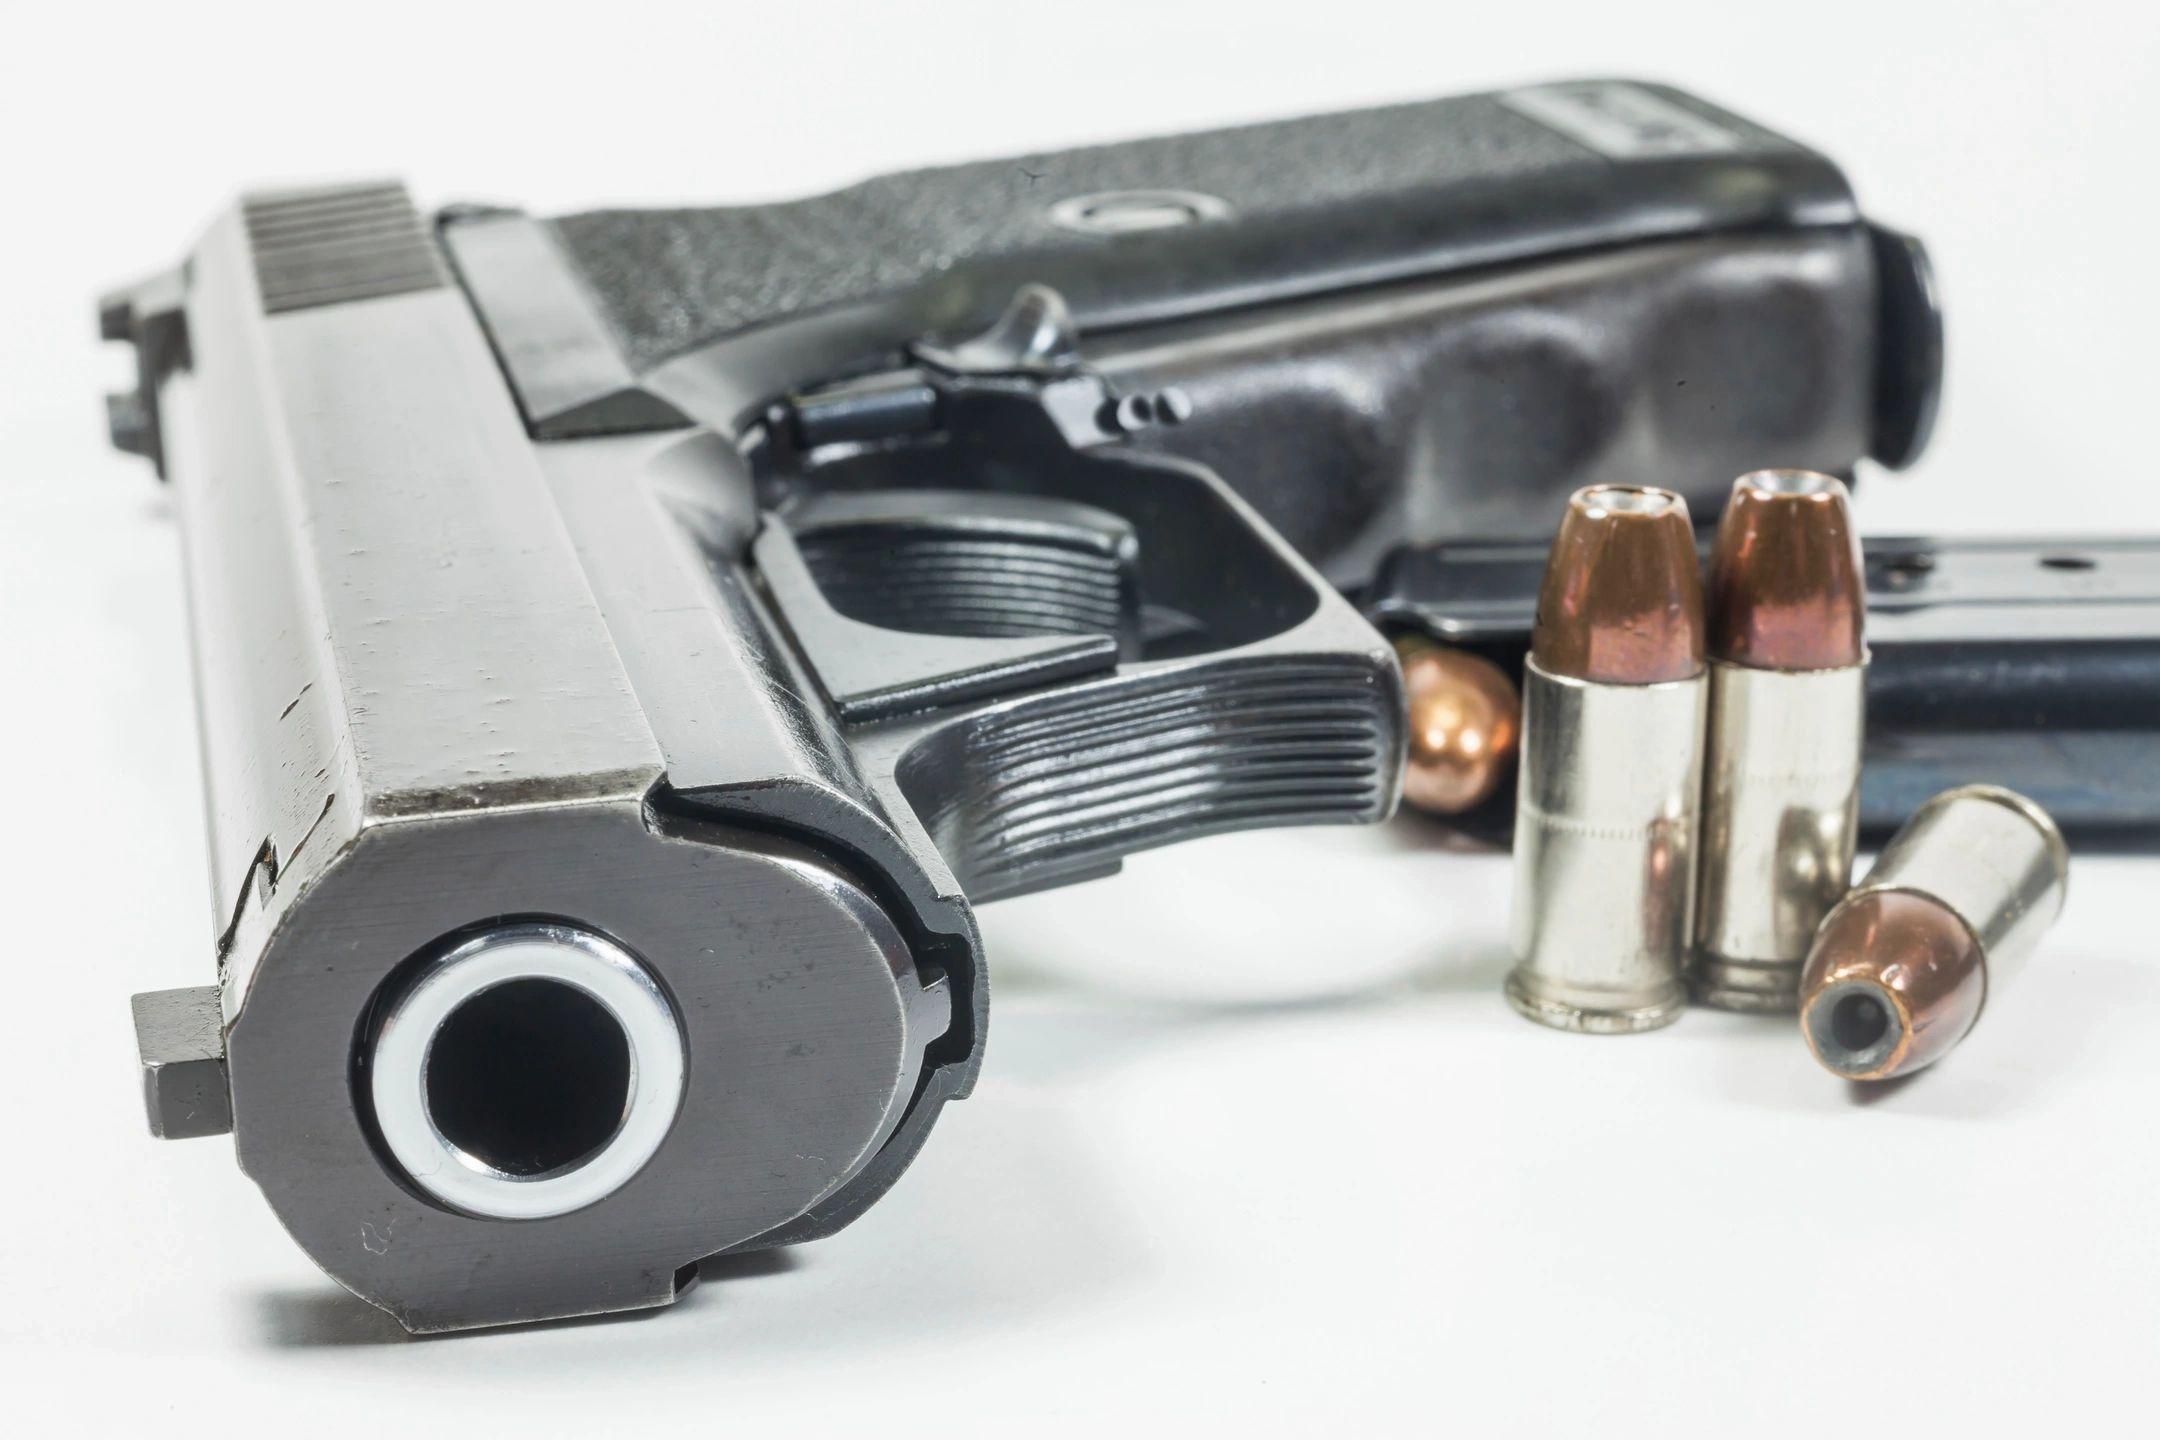 NEW GUNS | The Armory